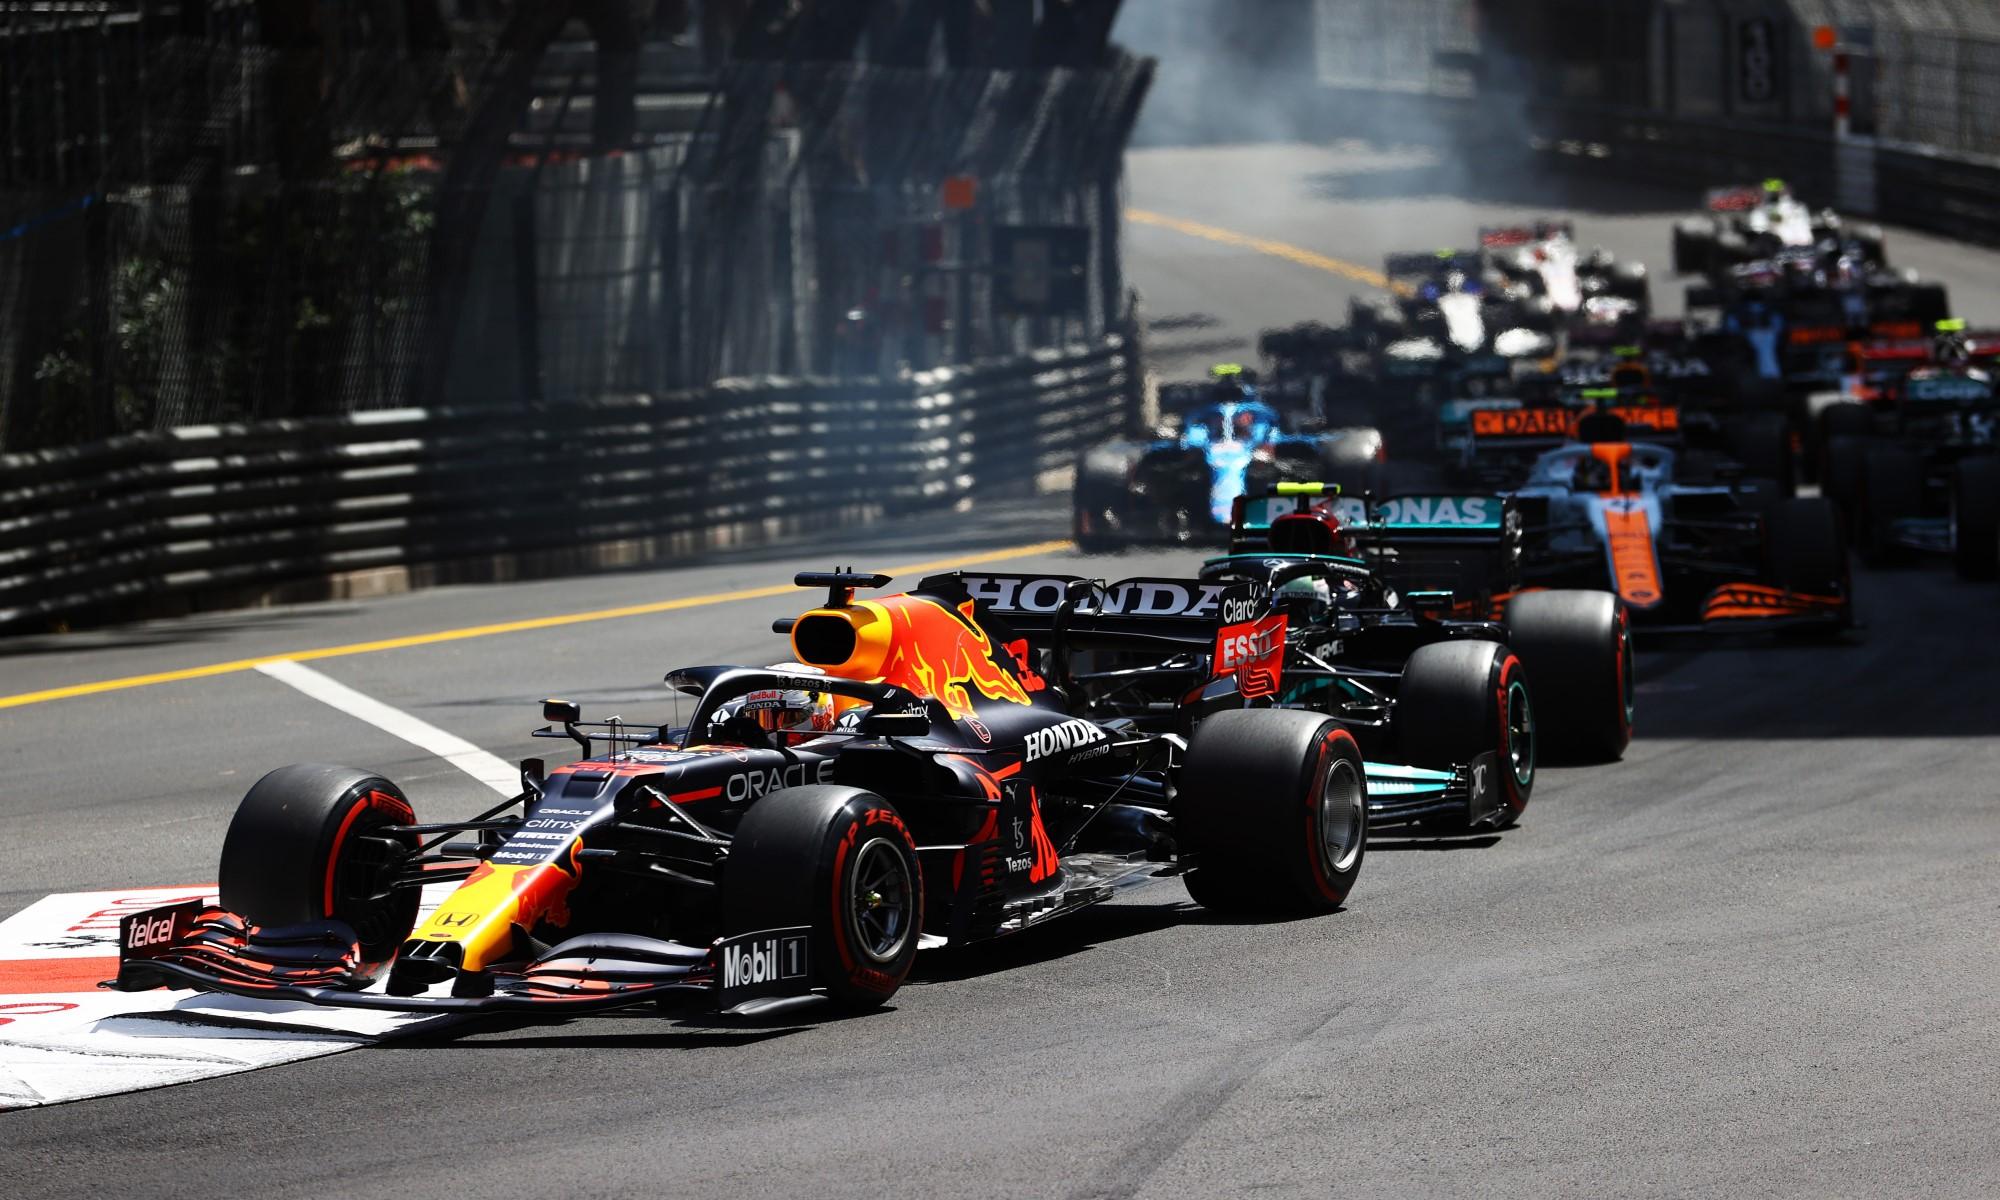 F1 Review Monaco 2021 start